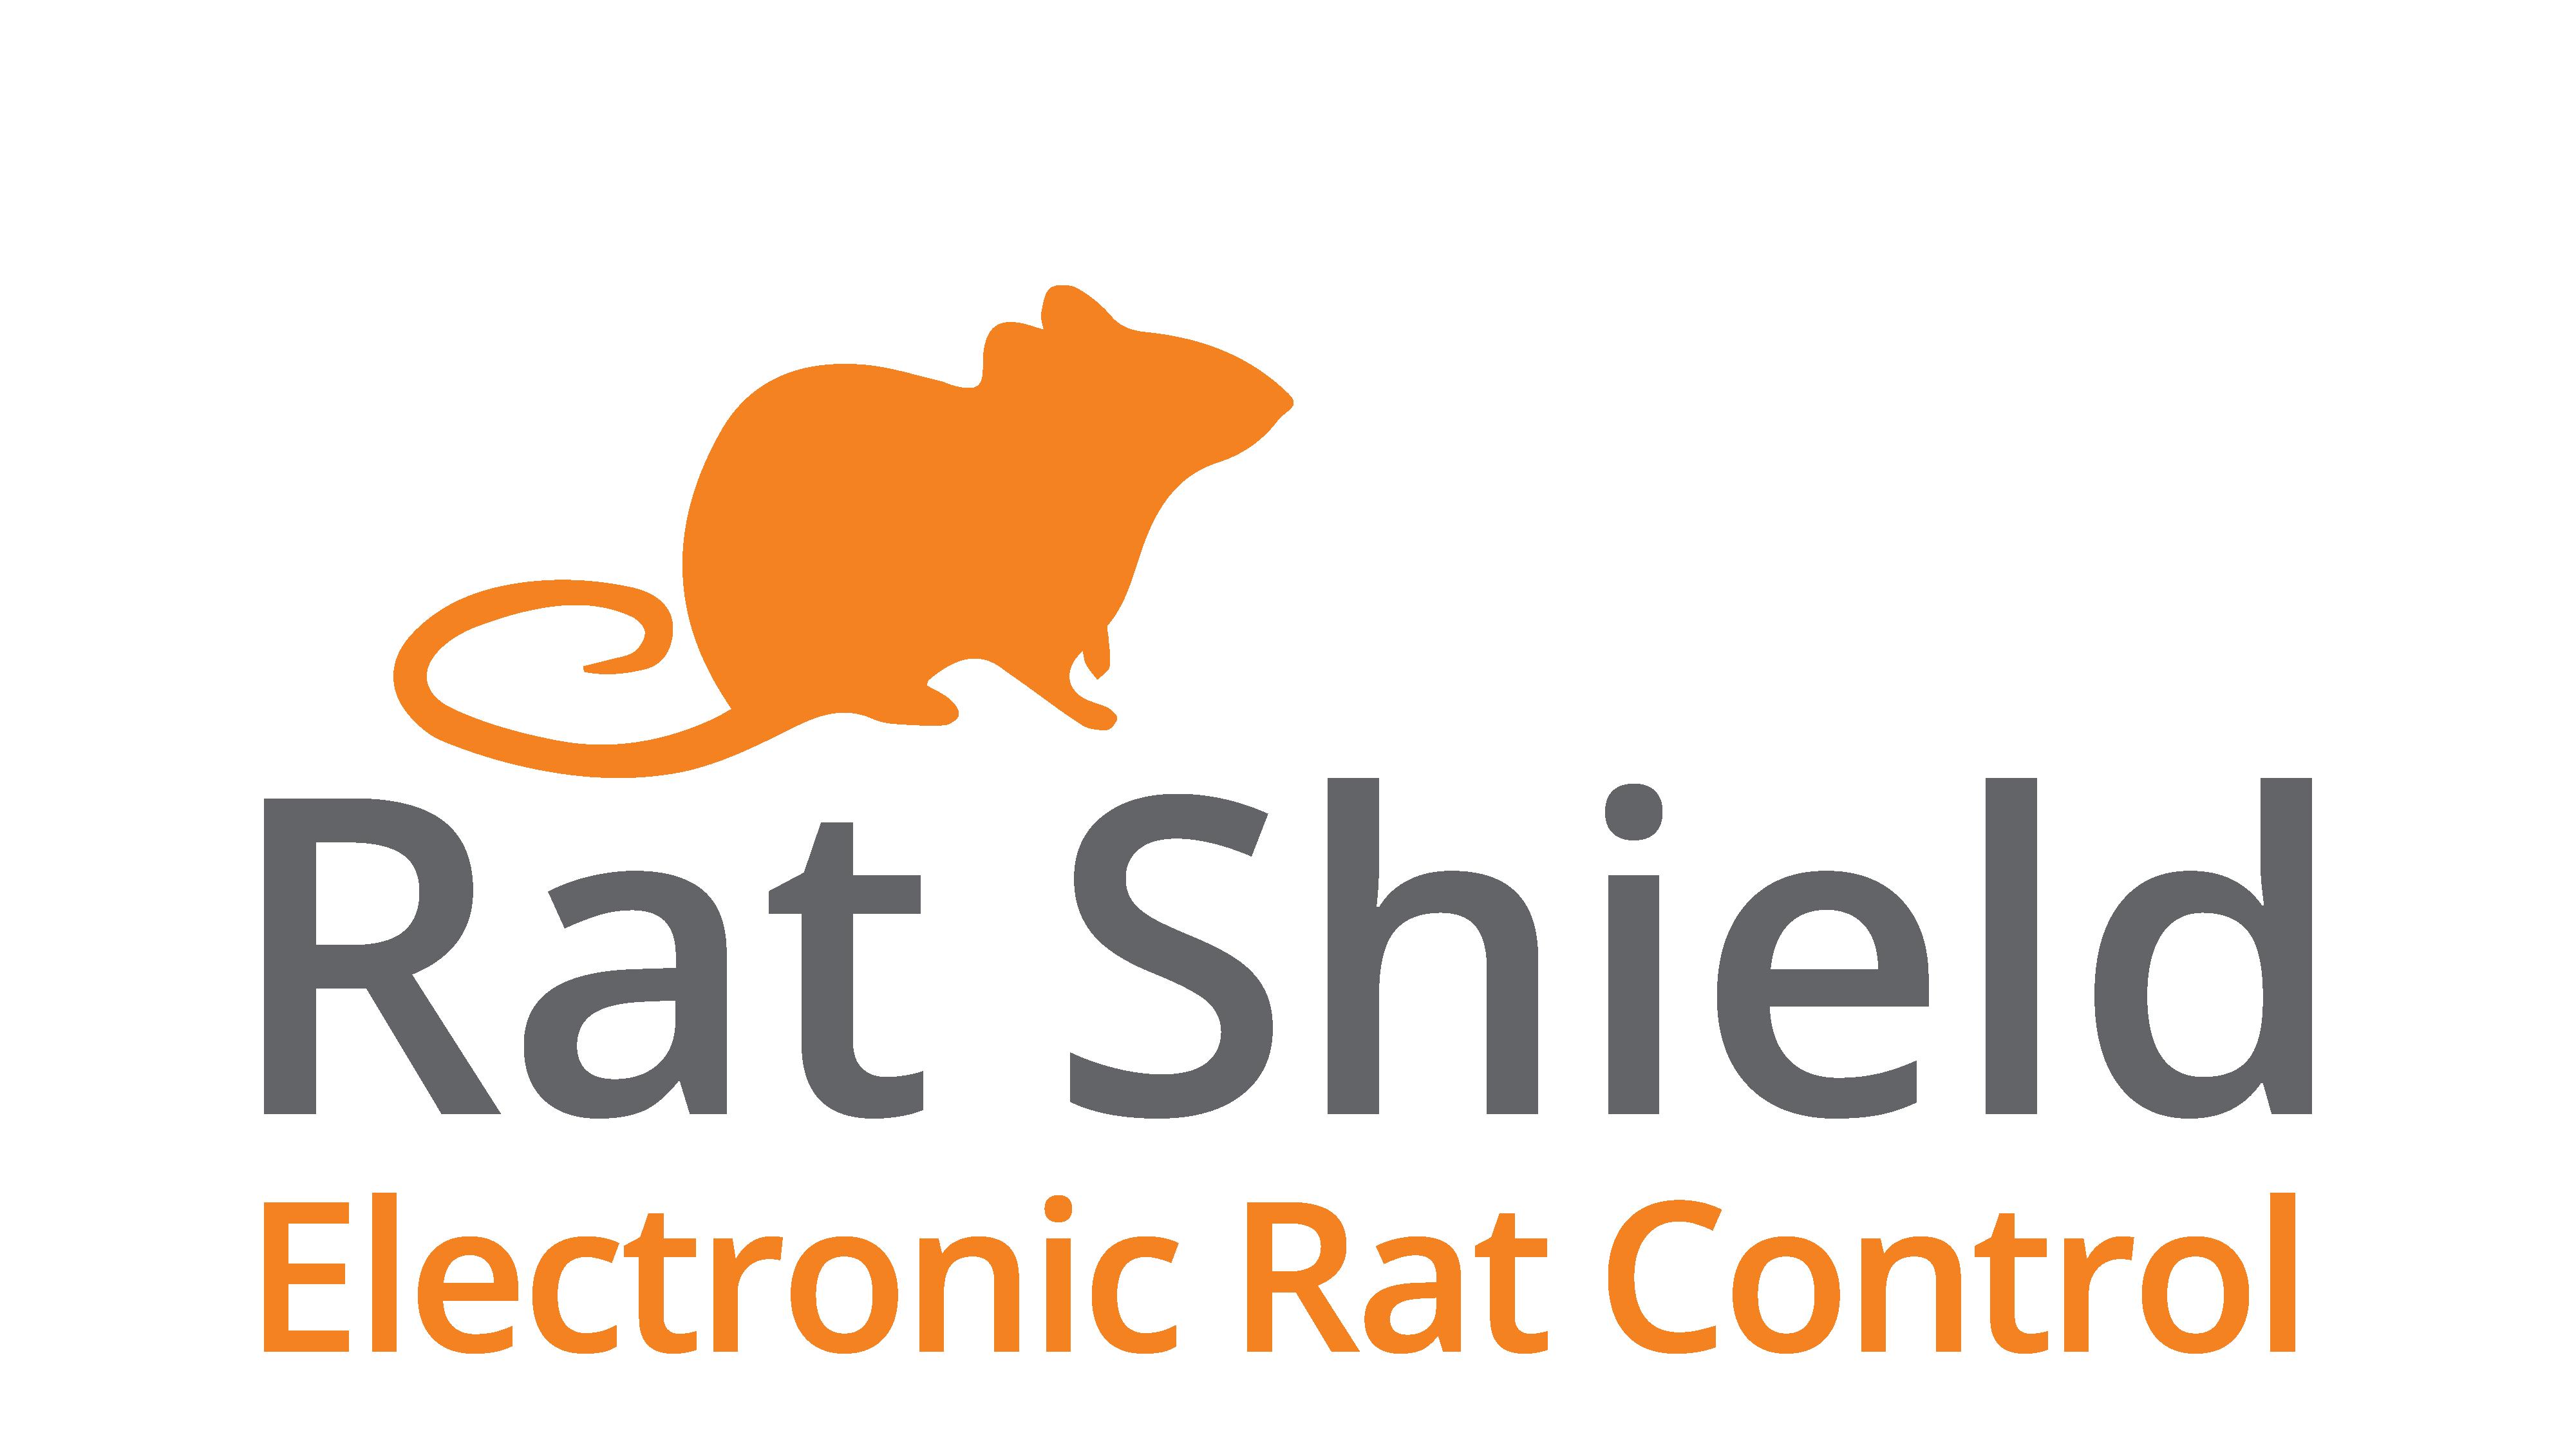 Rat Shiled